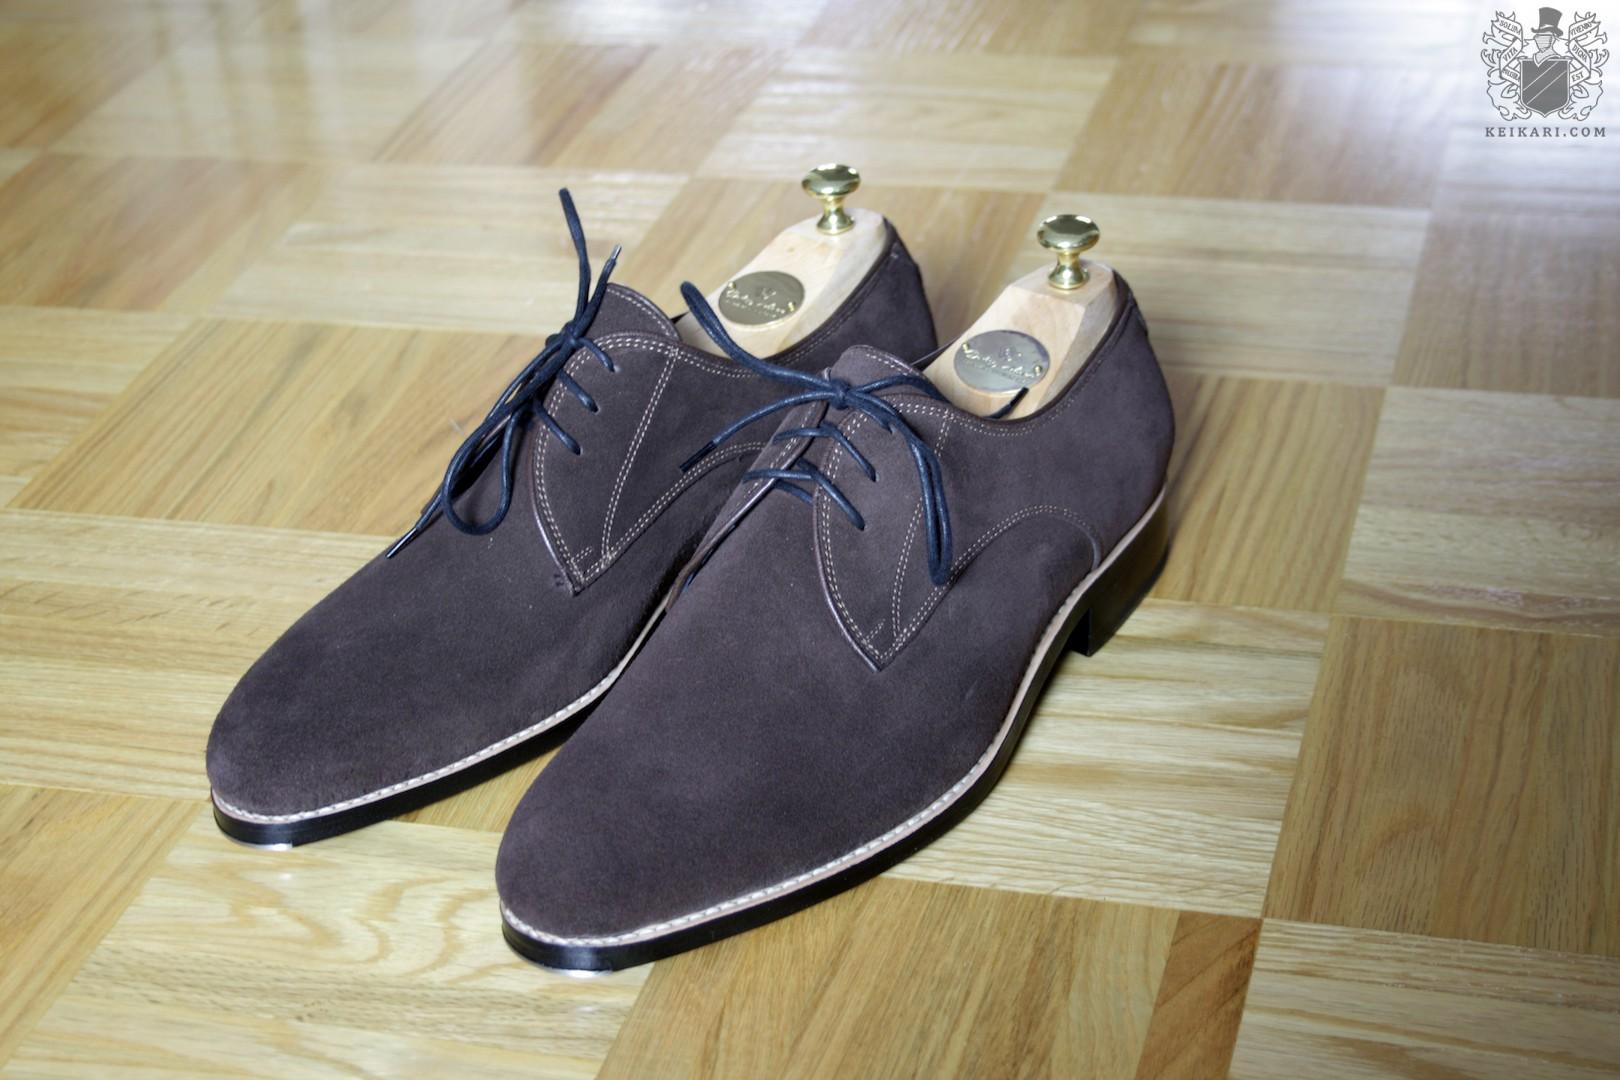 Anatomy_of_Buday_shoes_at_Keikari_dot_com03.jpg